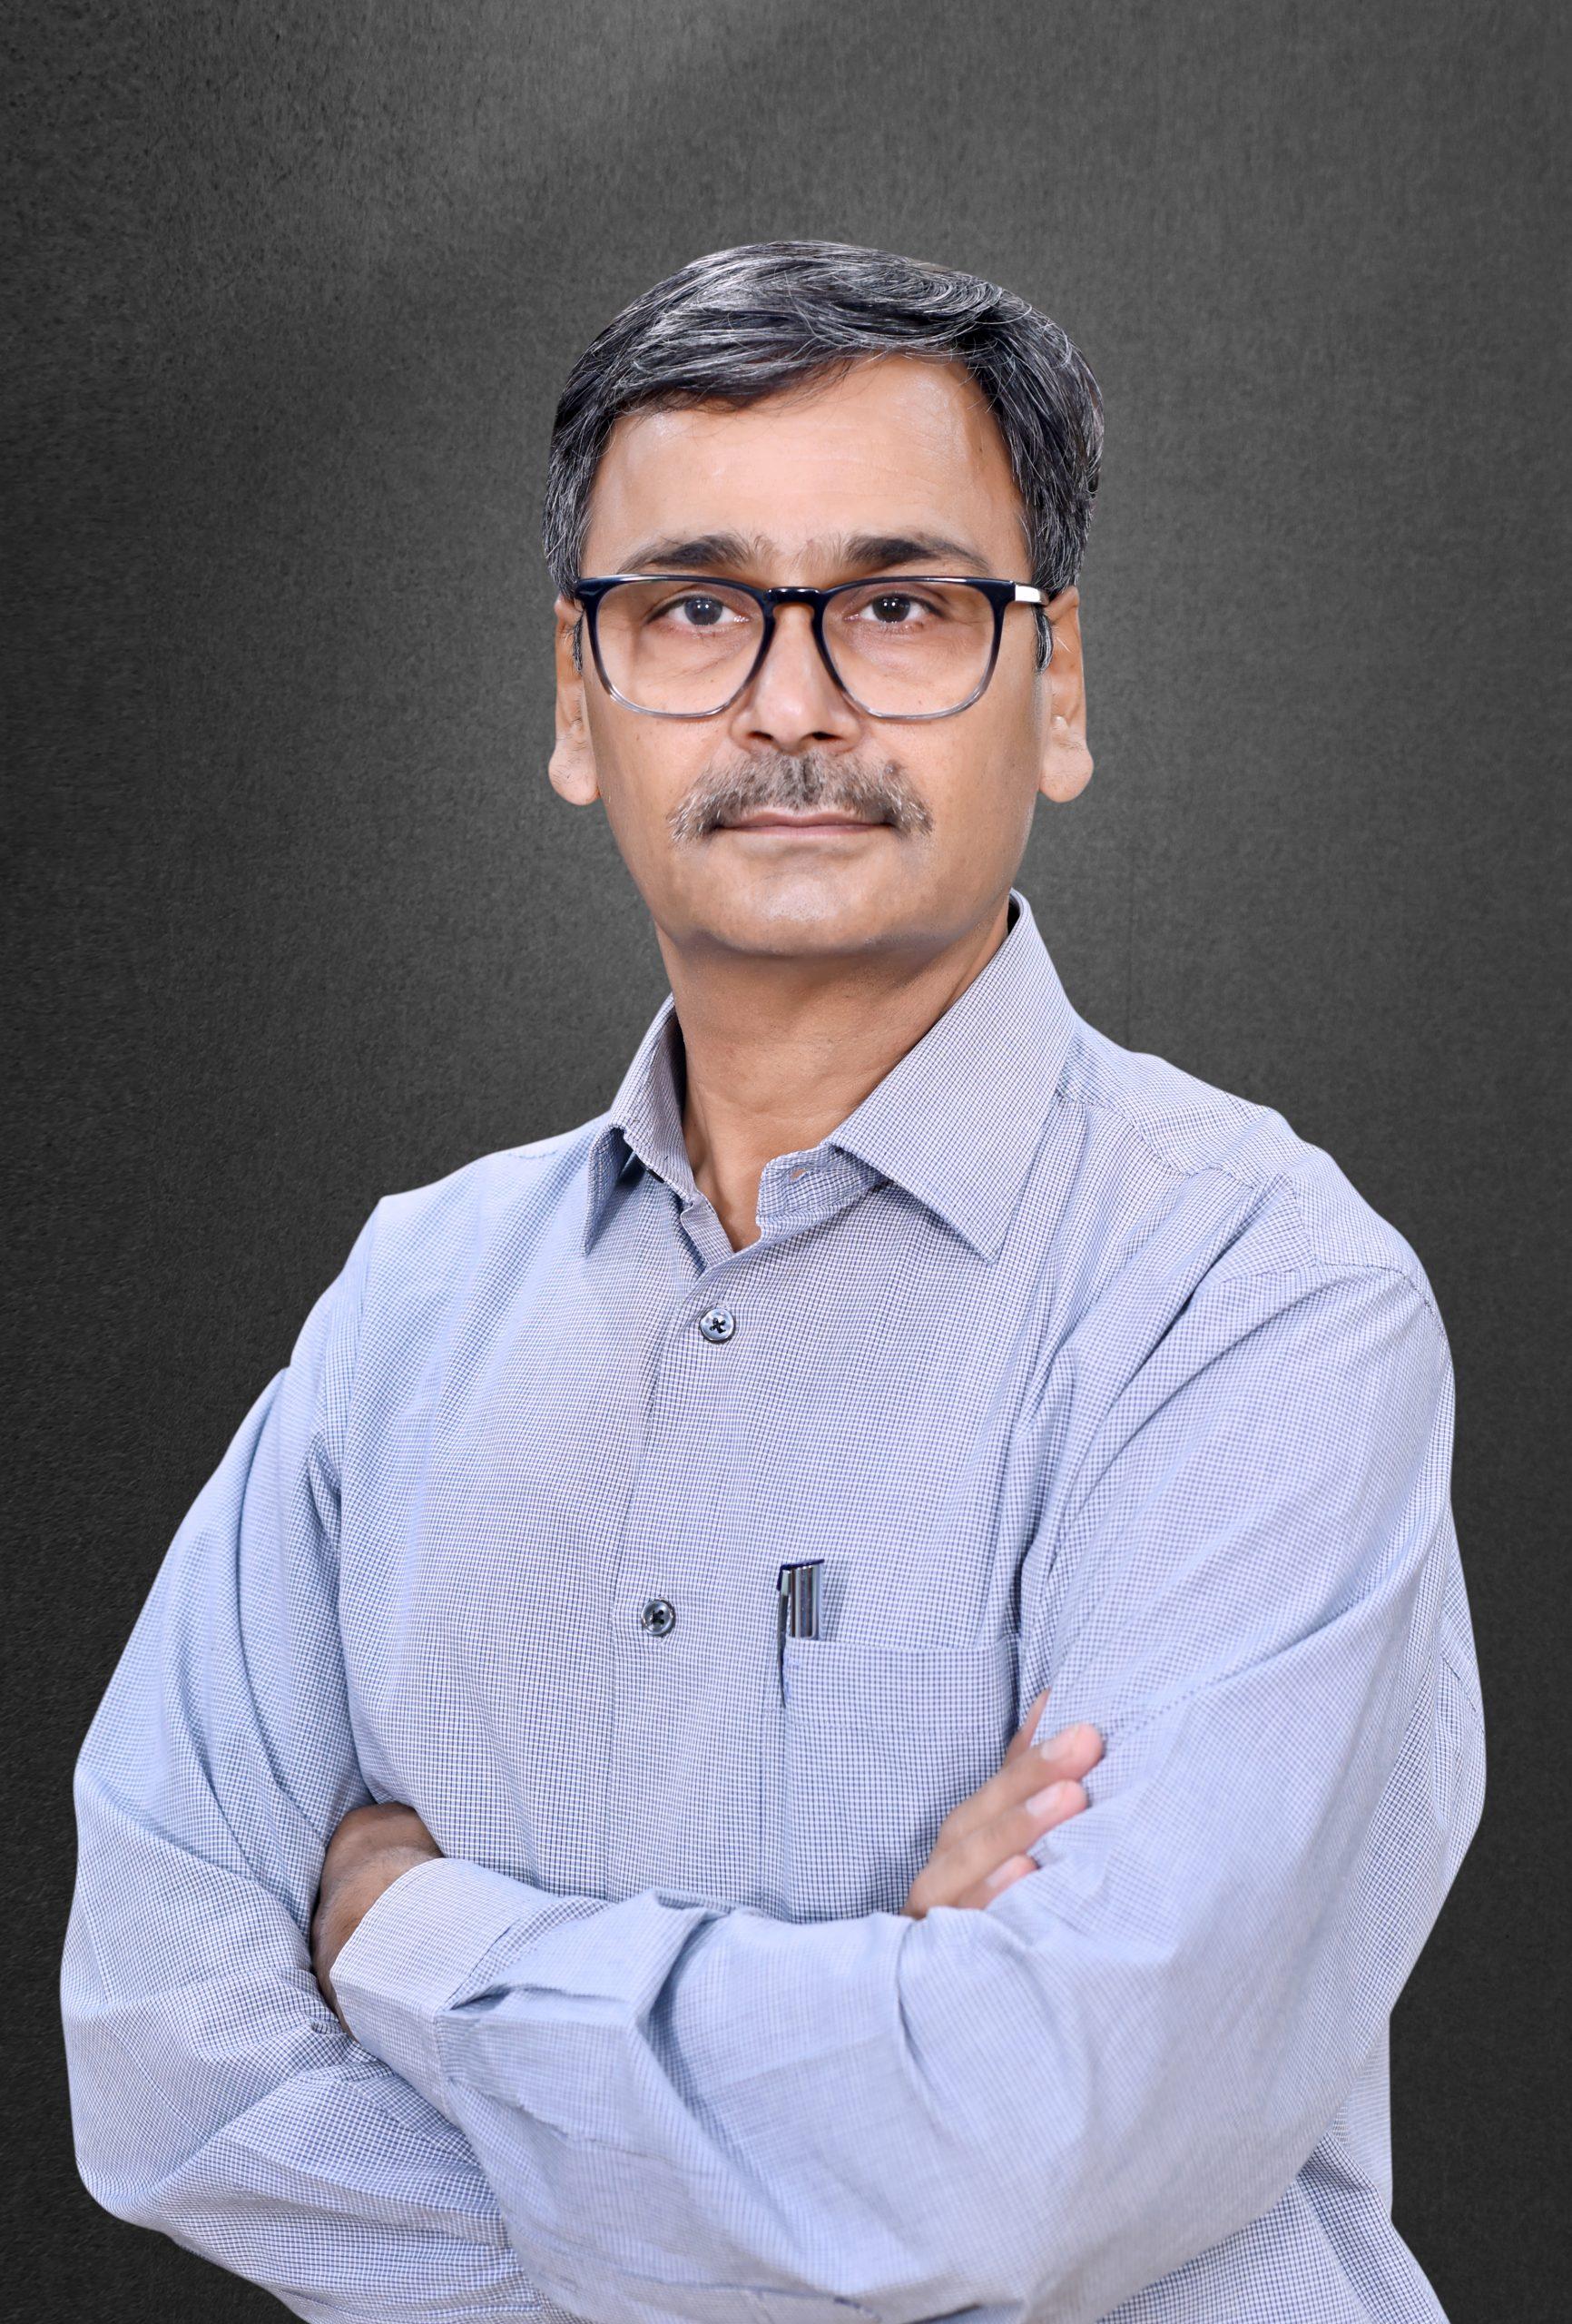 EESL appoints Mr Arun Kumar Mishra as CEO